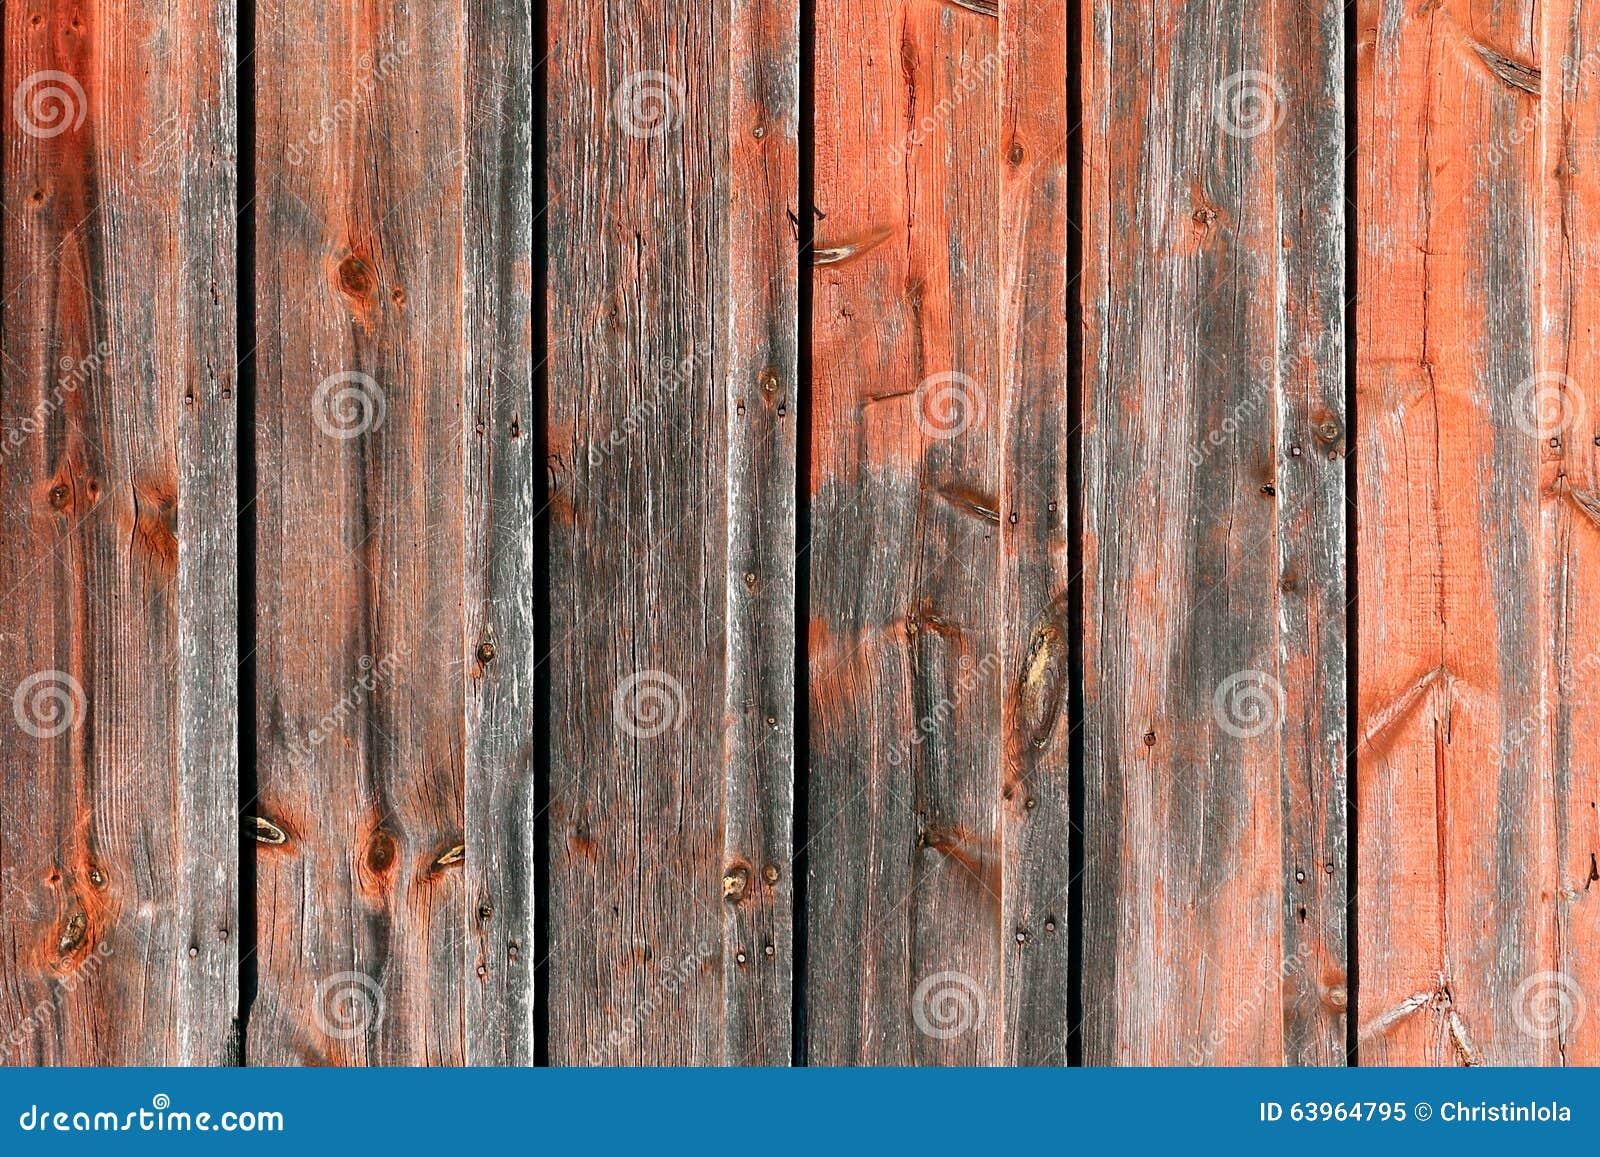 How To Paint Peeling Wood Siding